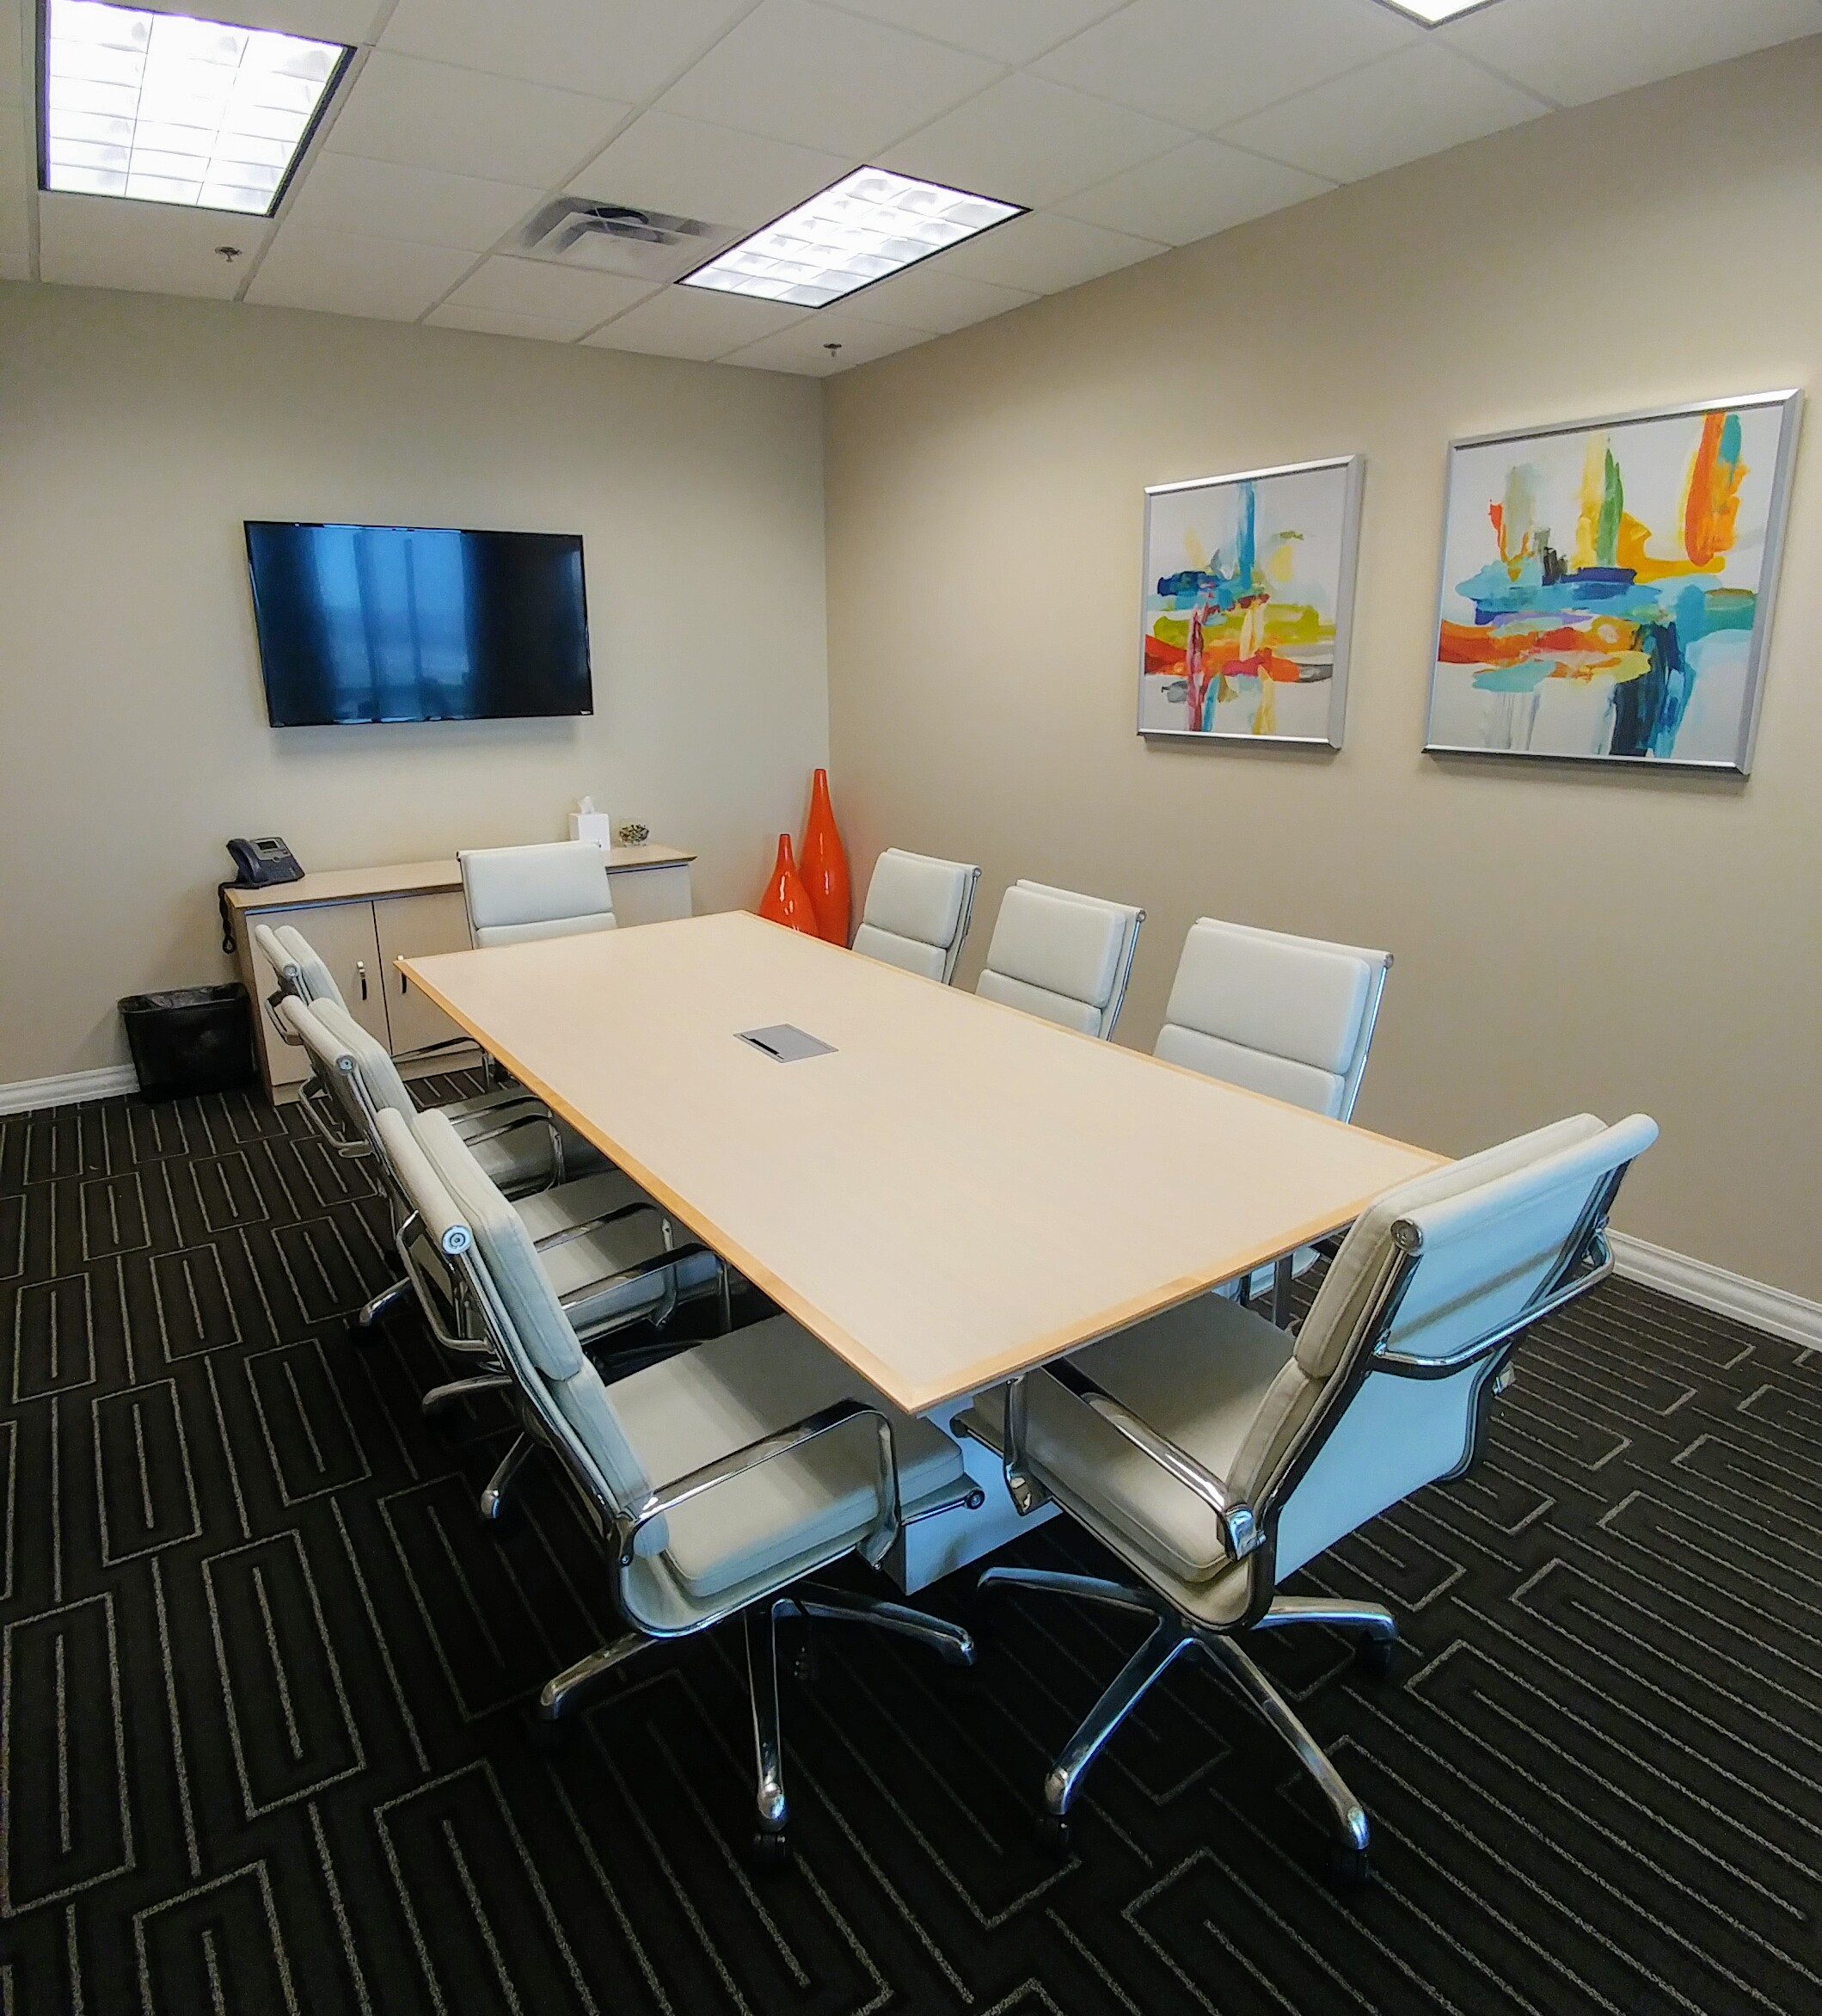 Premier - One Allen Center, Dallas